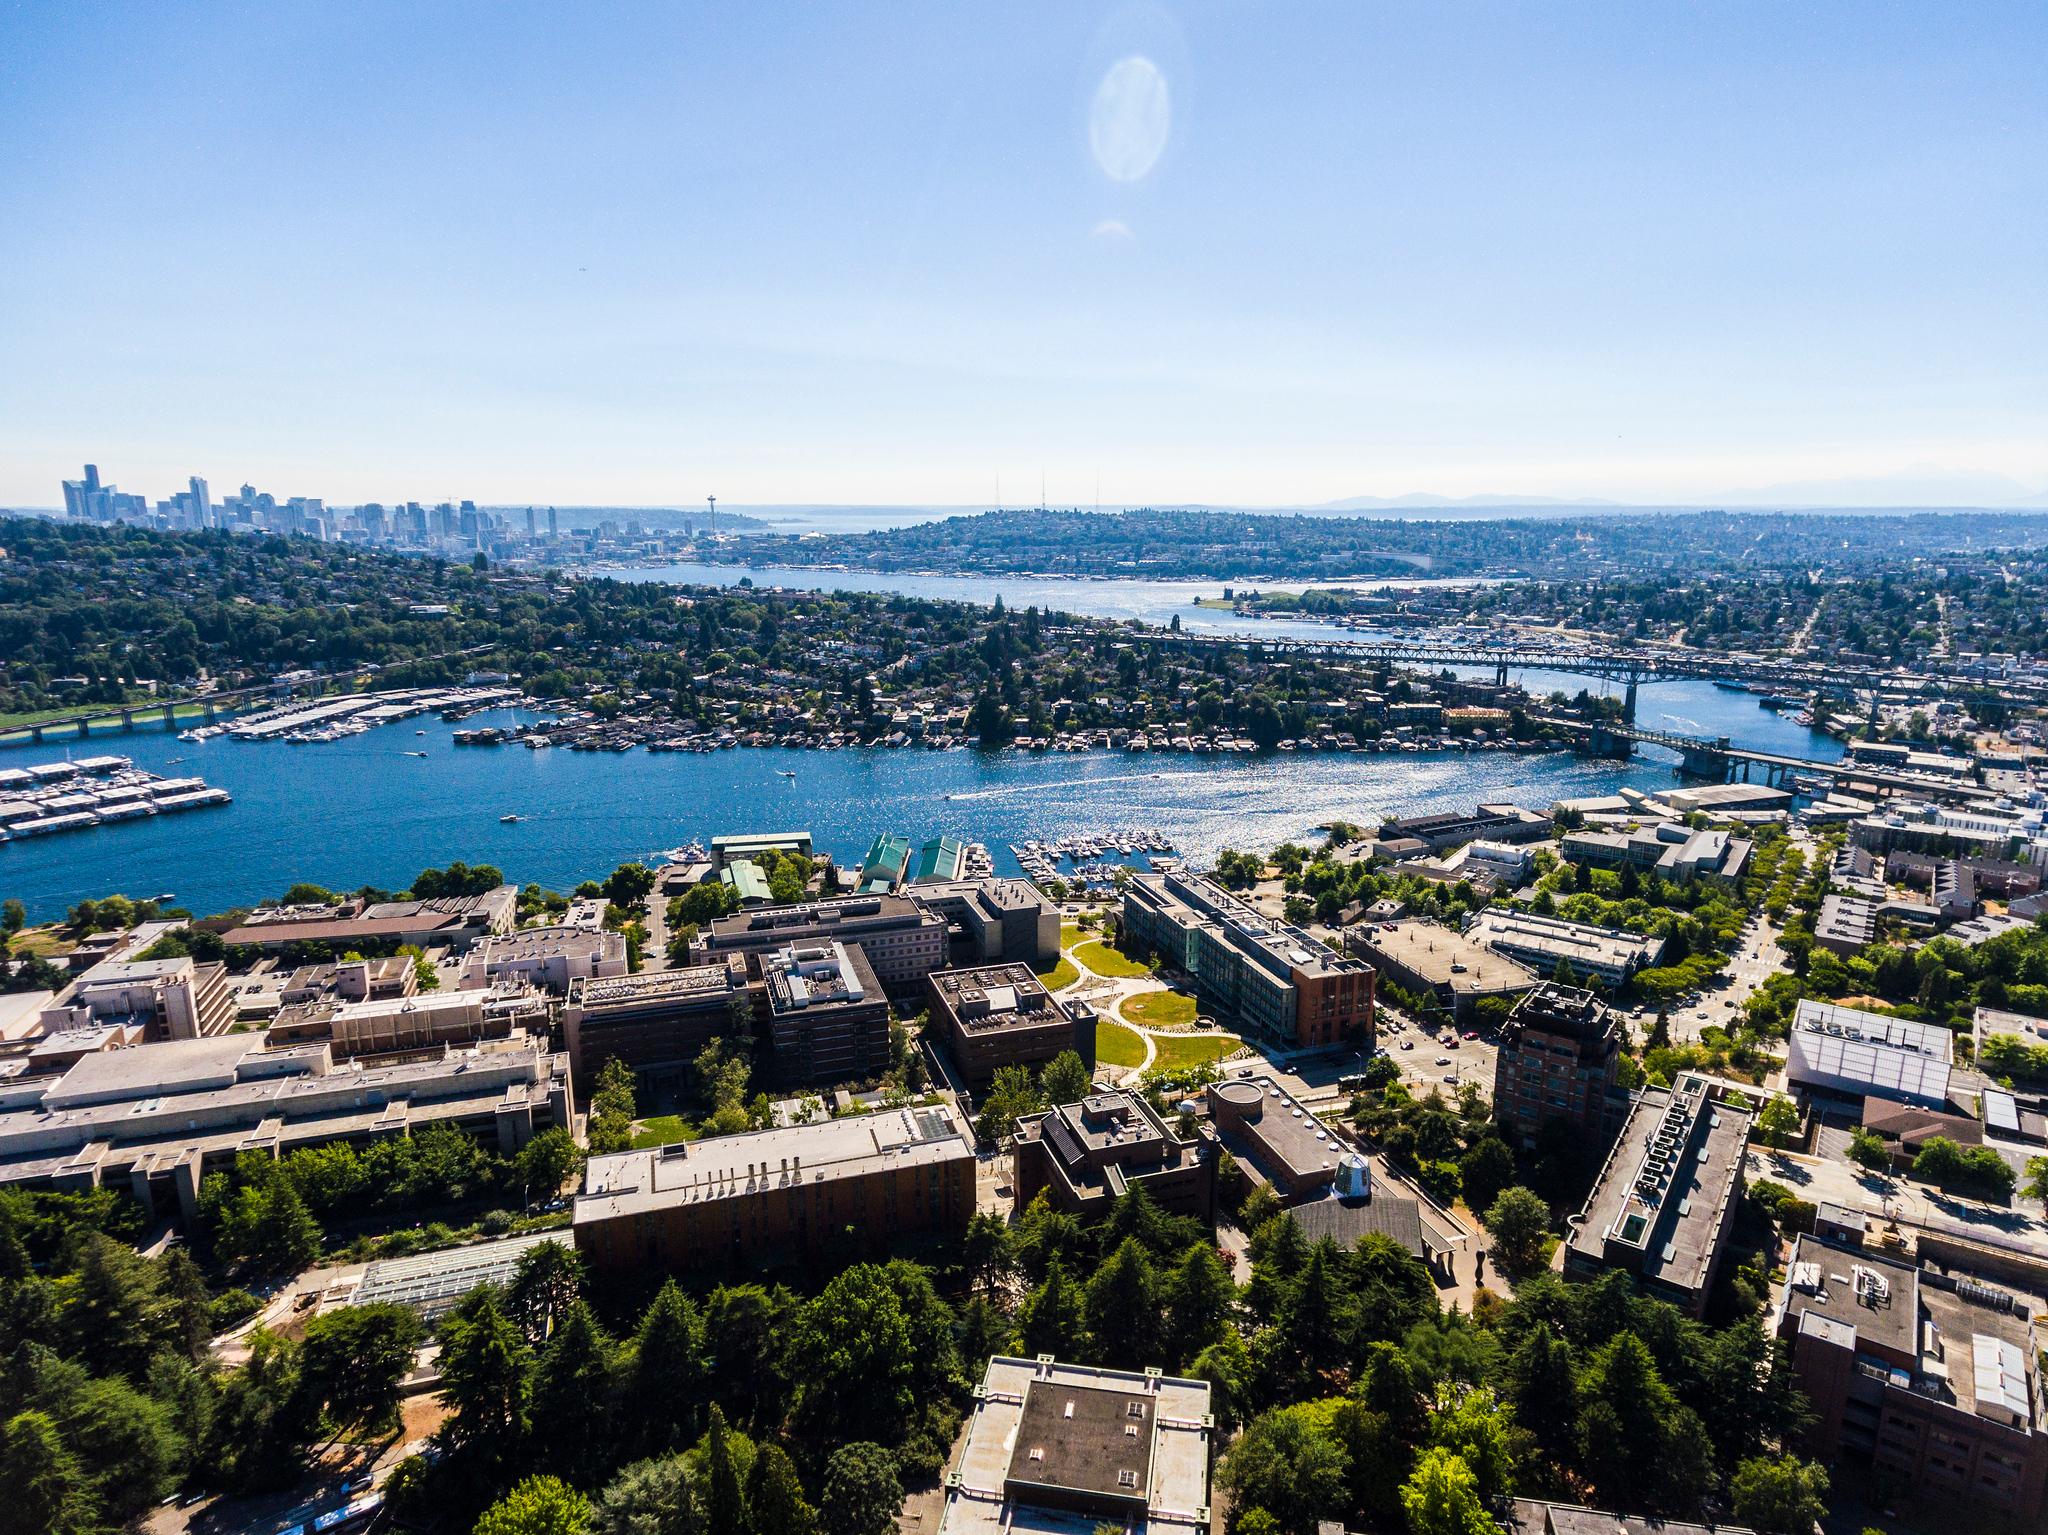 Campus Drone Images